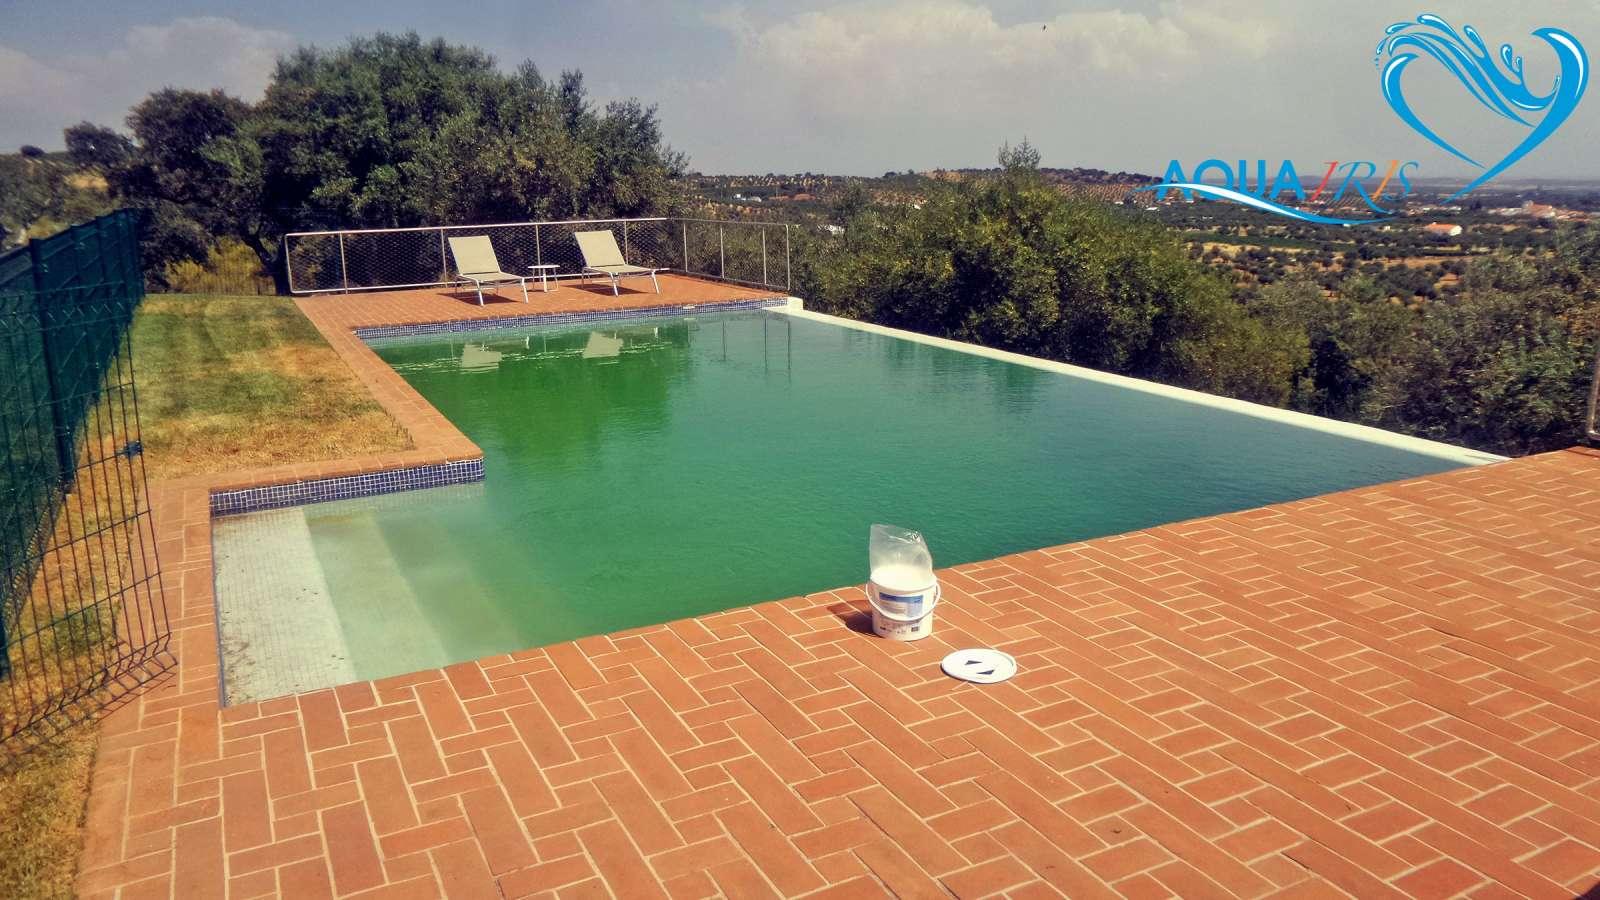 Agua verde piscina alentejo antes servi os de repara o - Agua de piscina verde ...